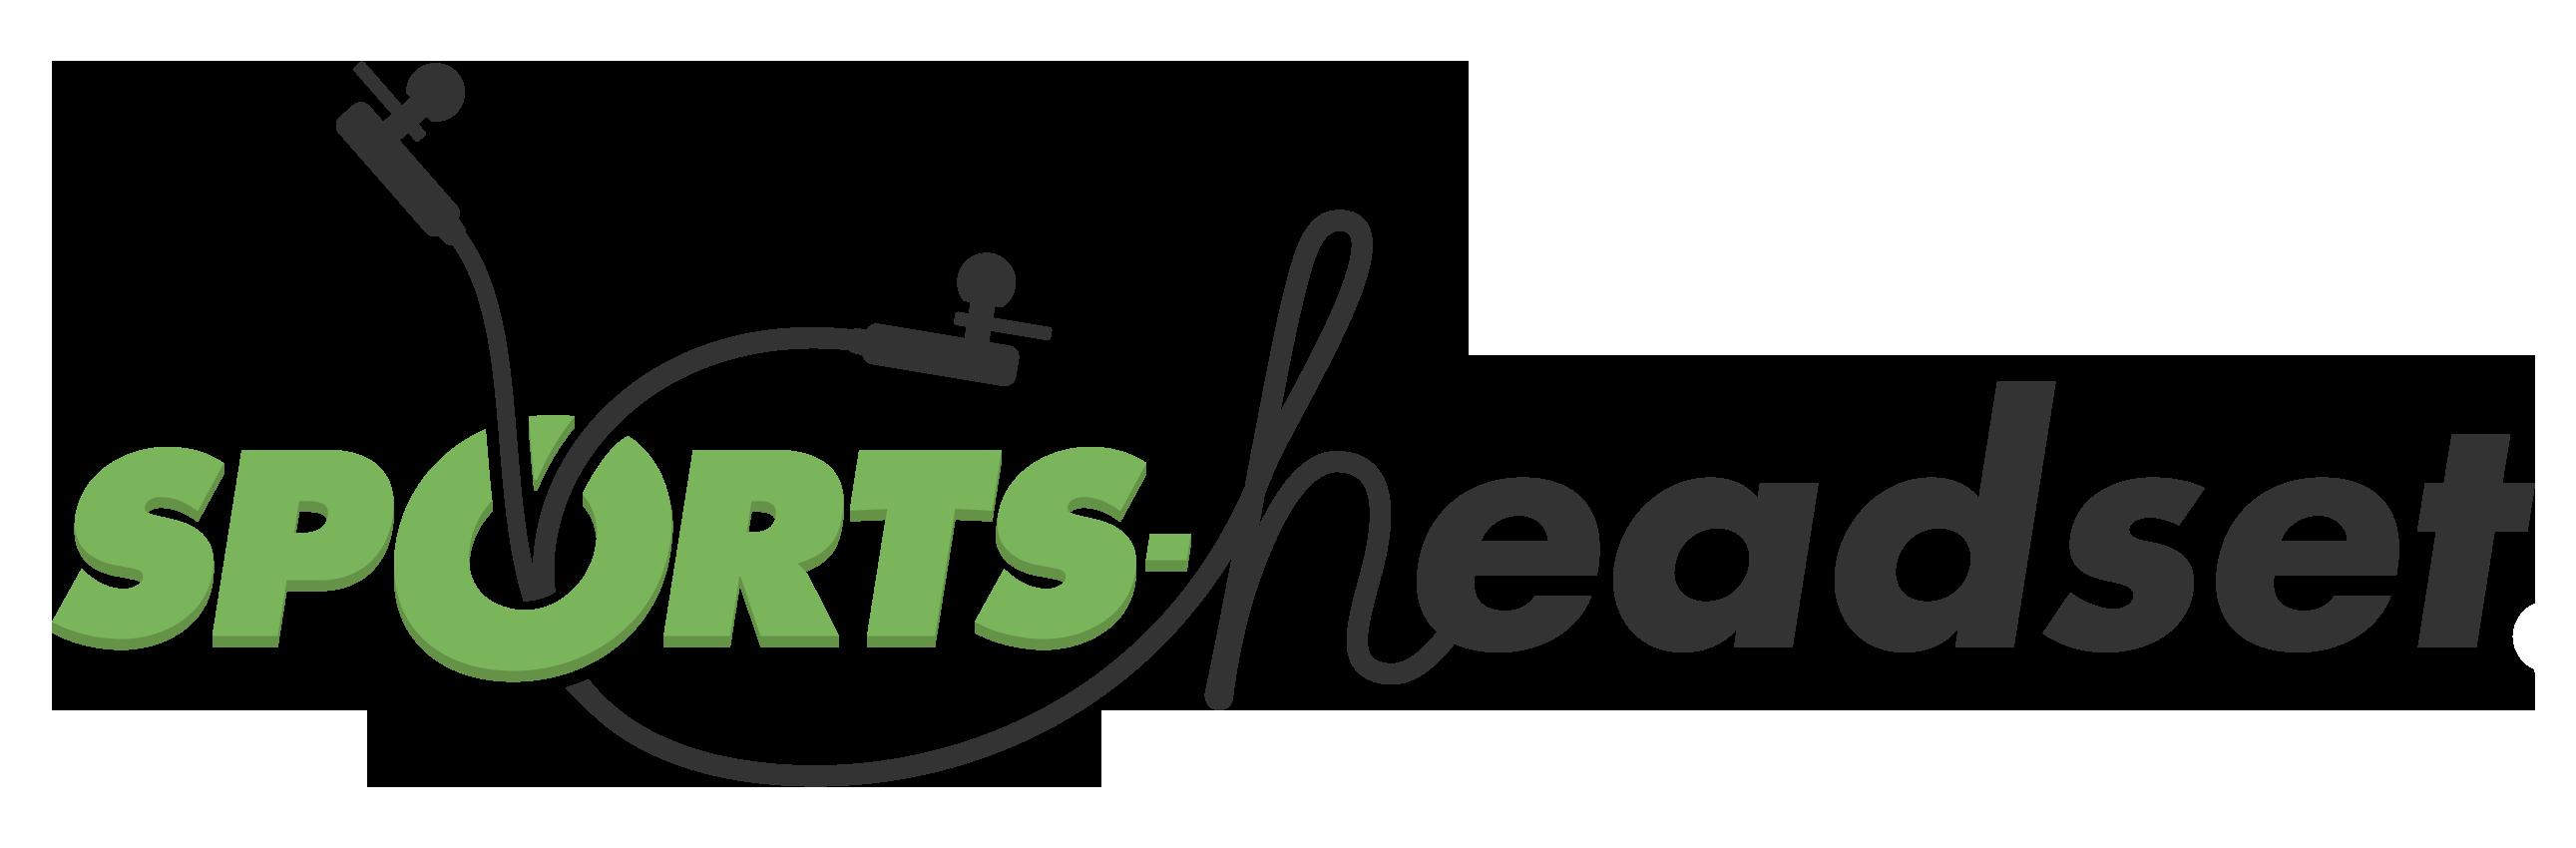 Sports-Headset-logo